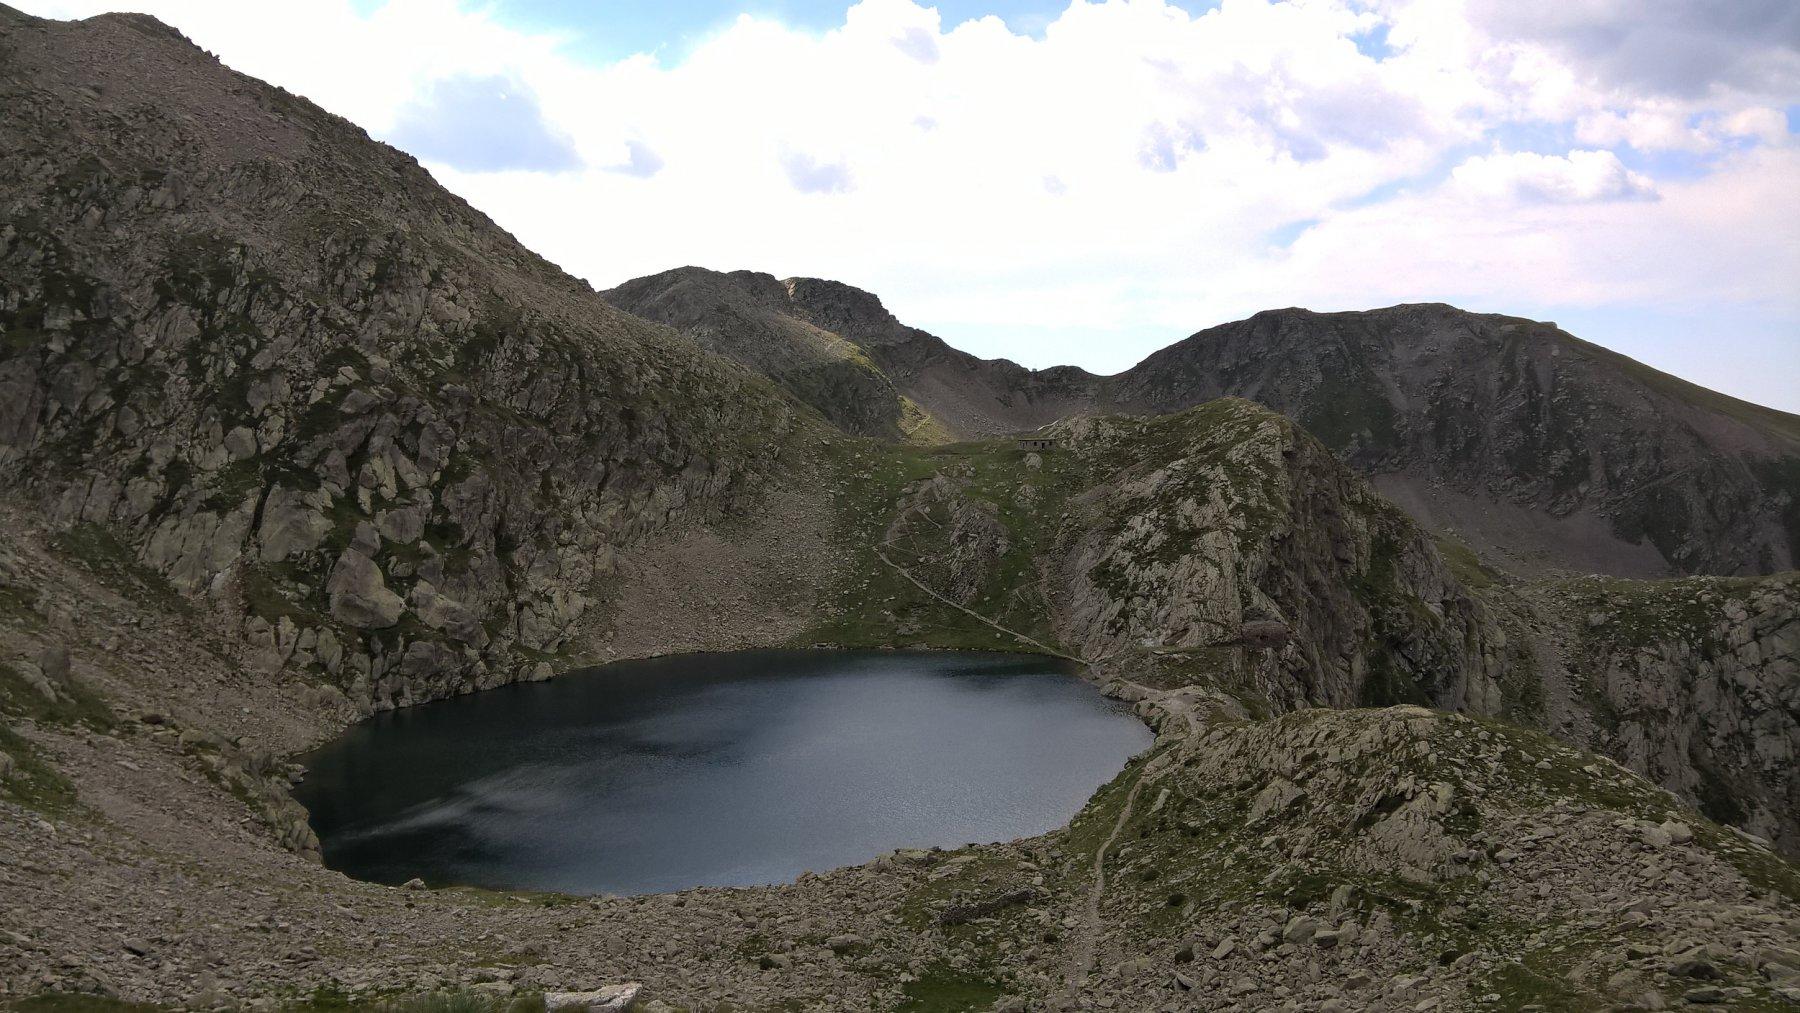 Tesina, Seboulè, Lausfer (Passi) da Sant'Anna di Vinadio, giro dei laghi di Sant'Anna 2017-07-11